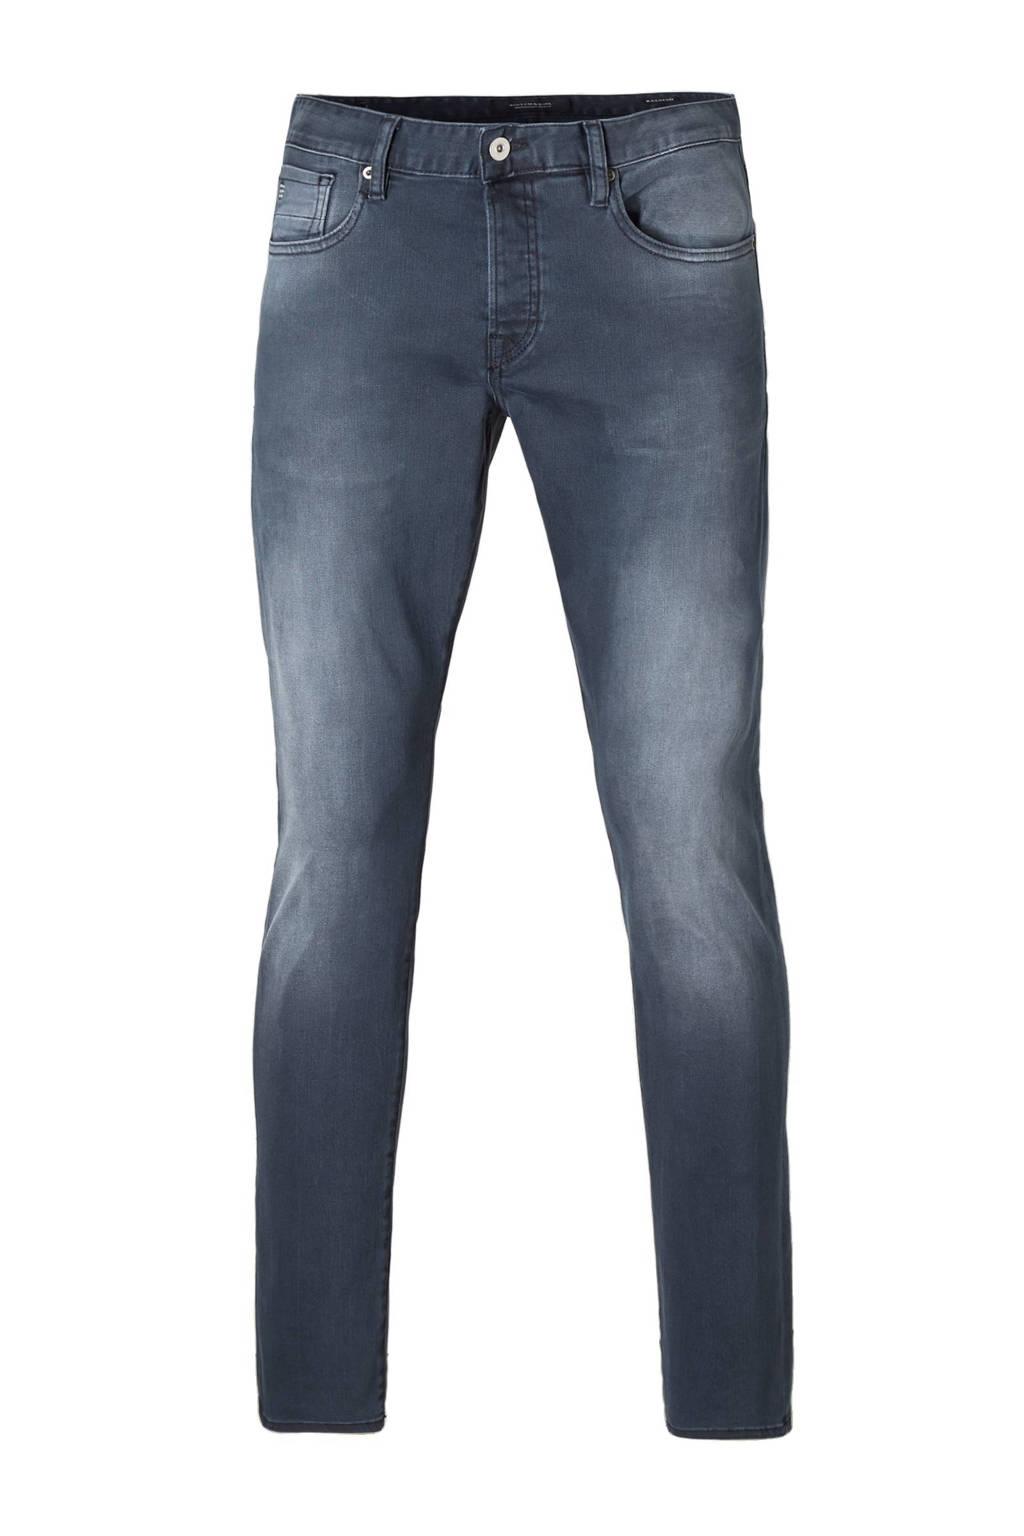 Scotch & Soda  regular Ralston regular slim fit jeans, OE Concrete Blues